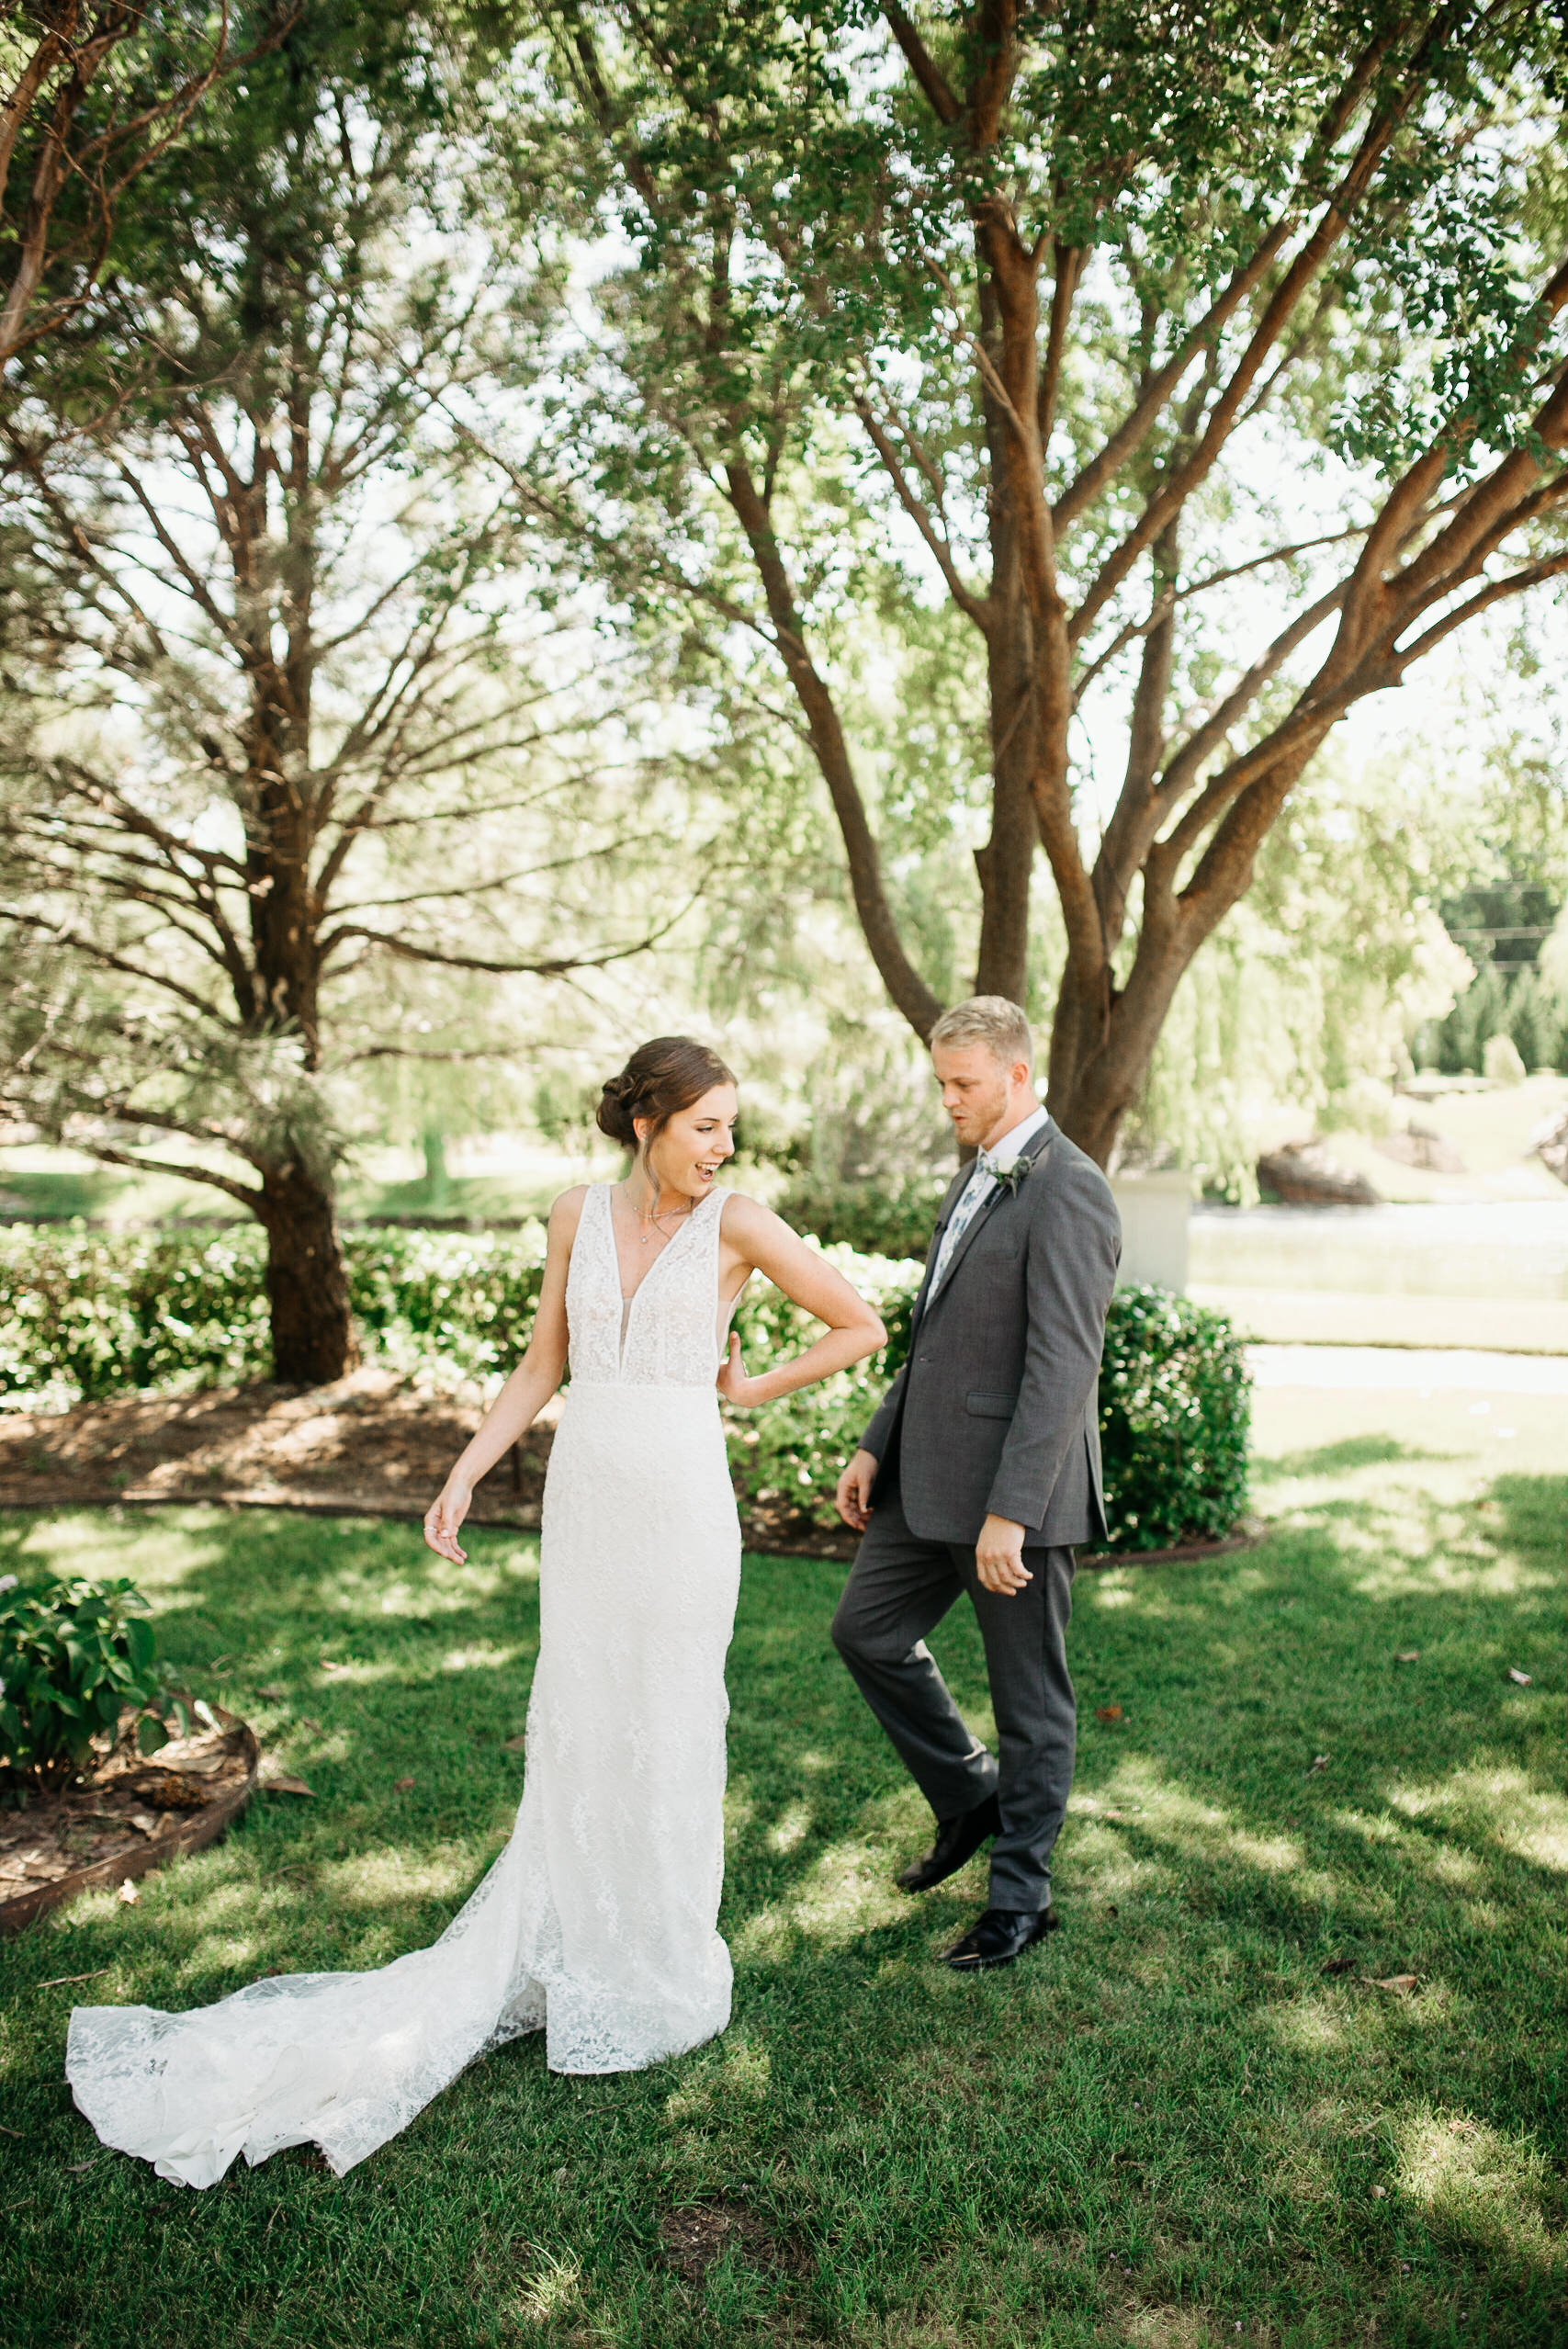 okc-wedding-photographer-coles-garden-wedding-okc-best-wedding-photographers-42.jpg